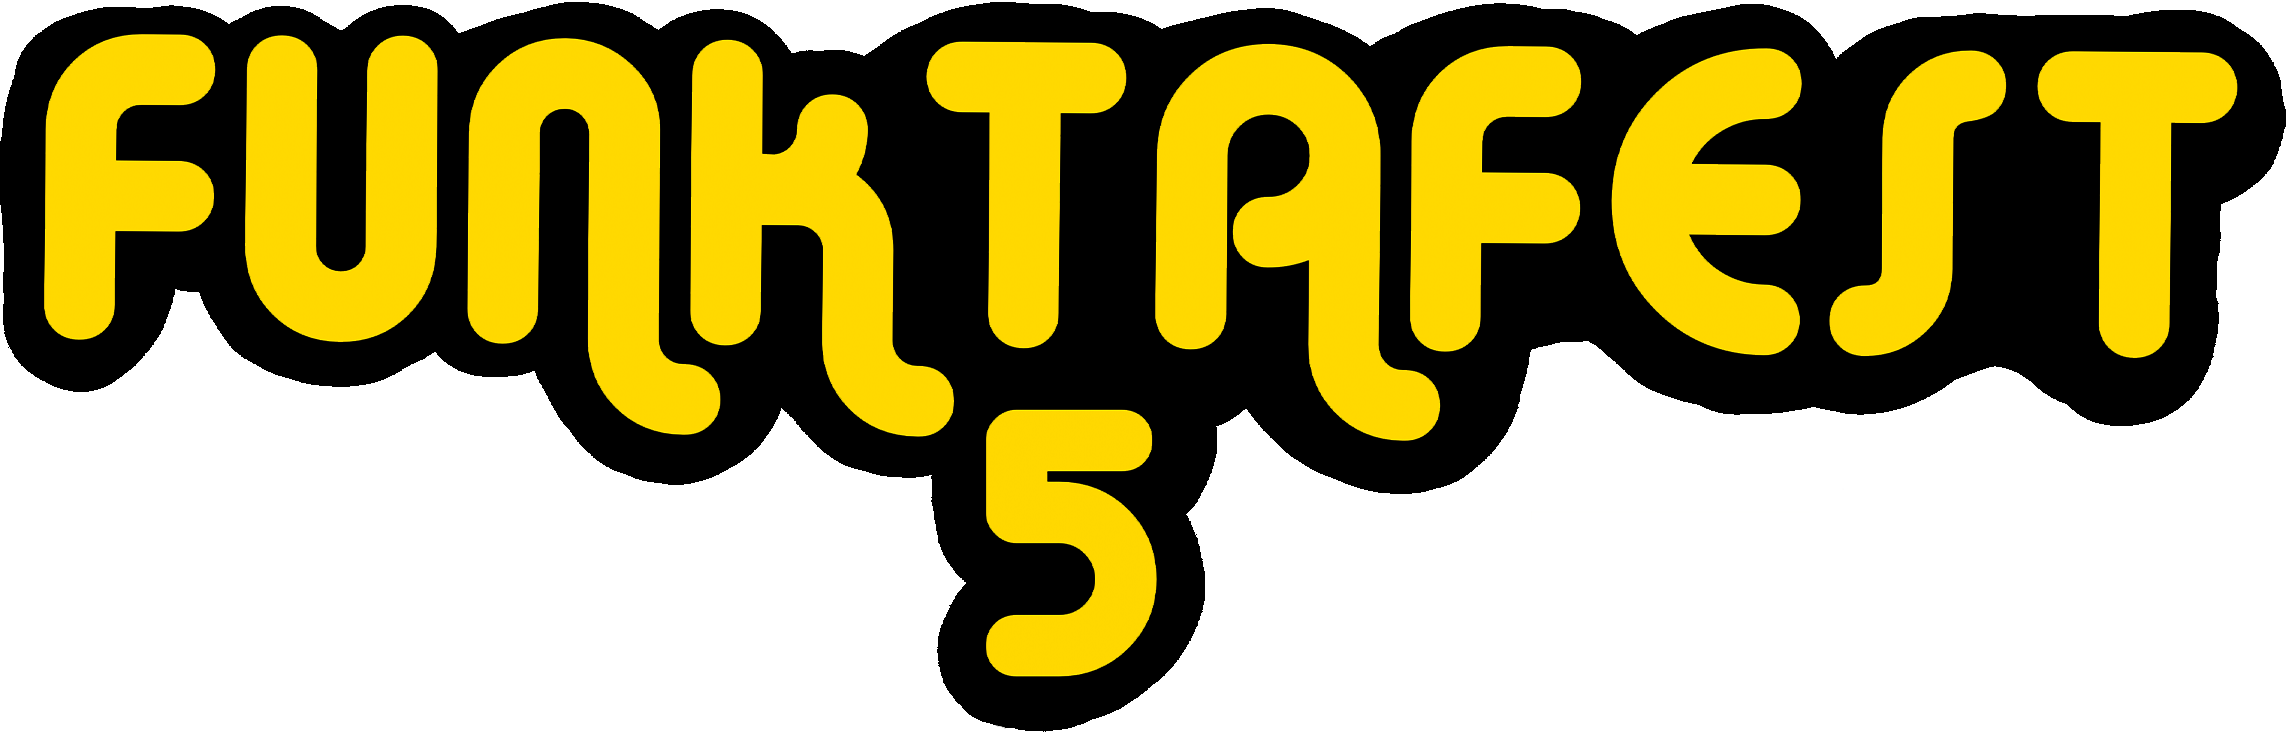 Funktafest logo